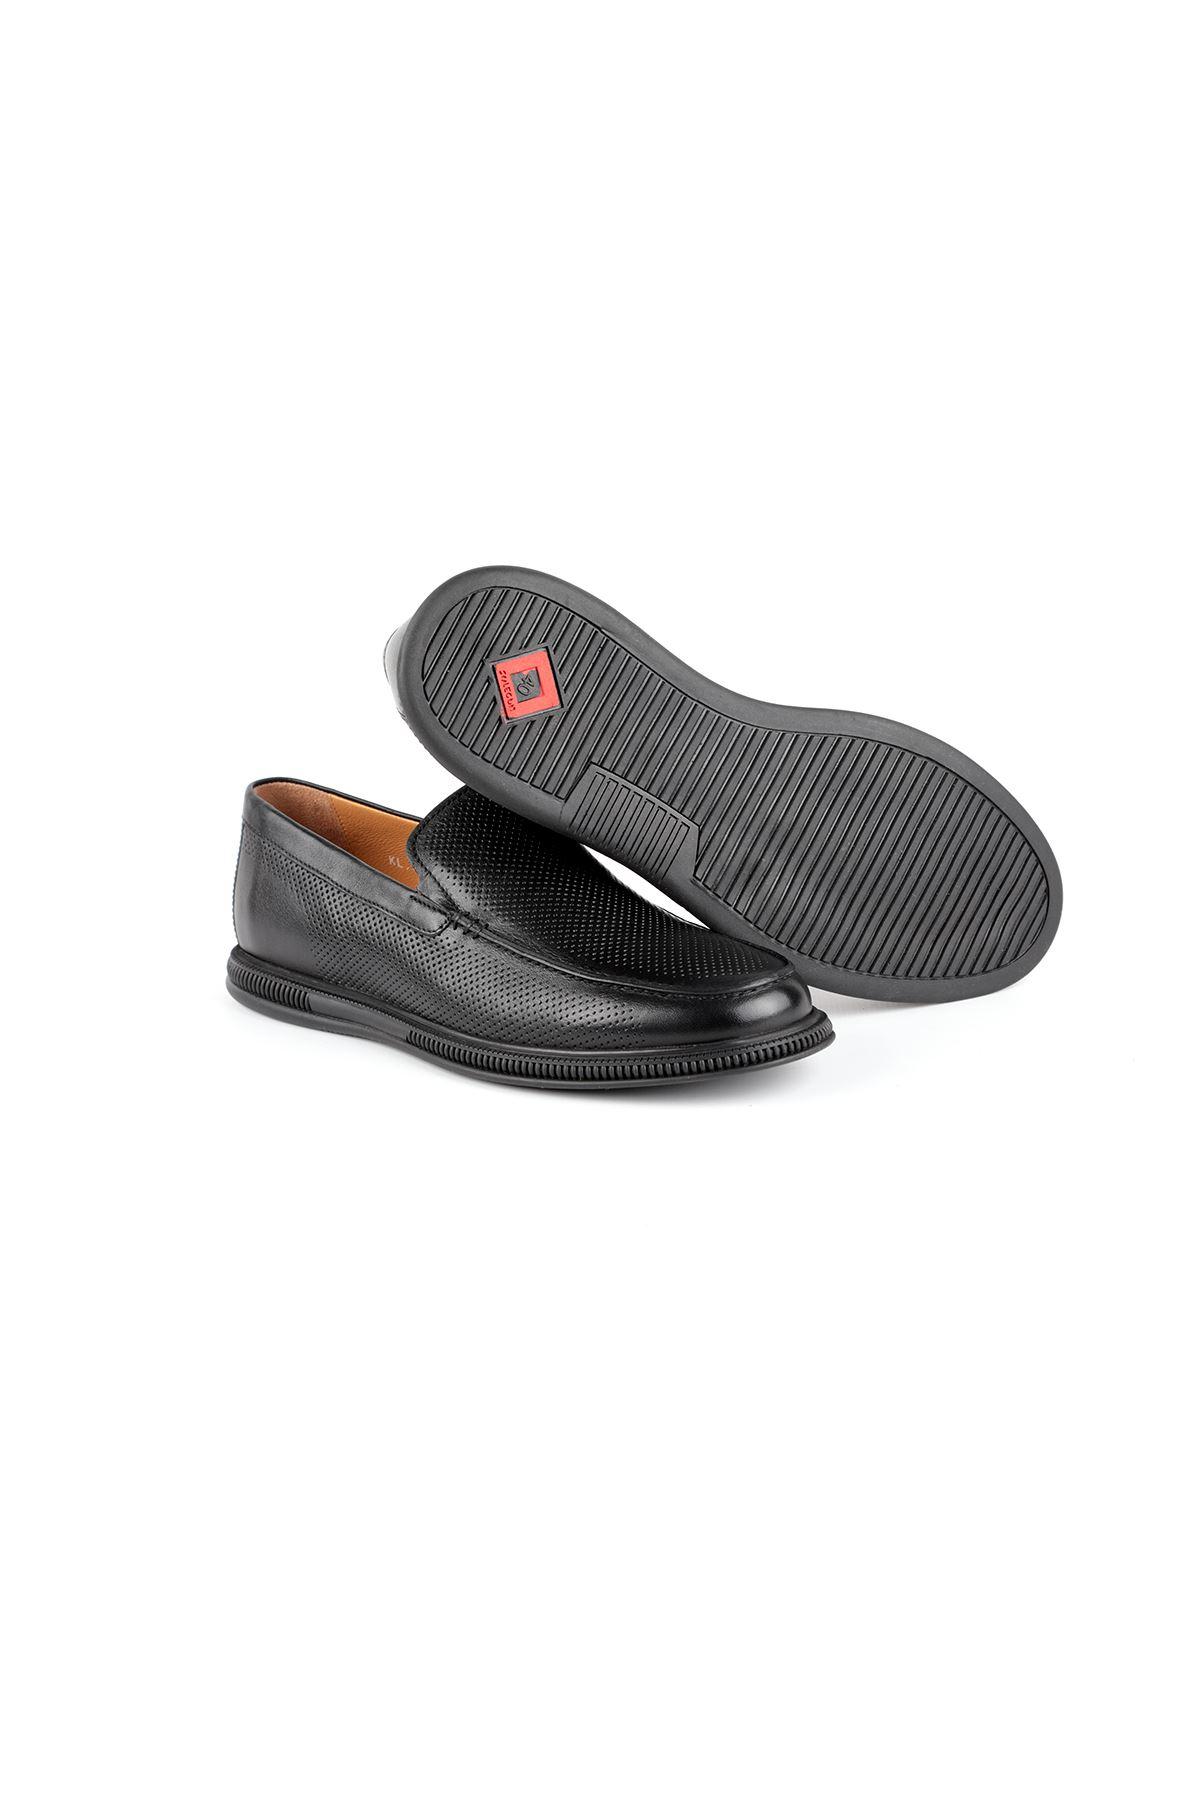 Libero L3788 Black Loafer Shoes